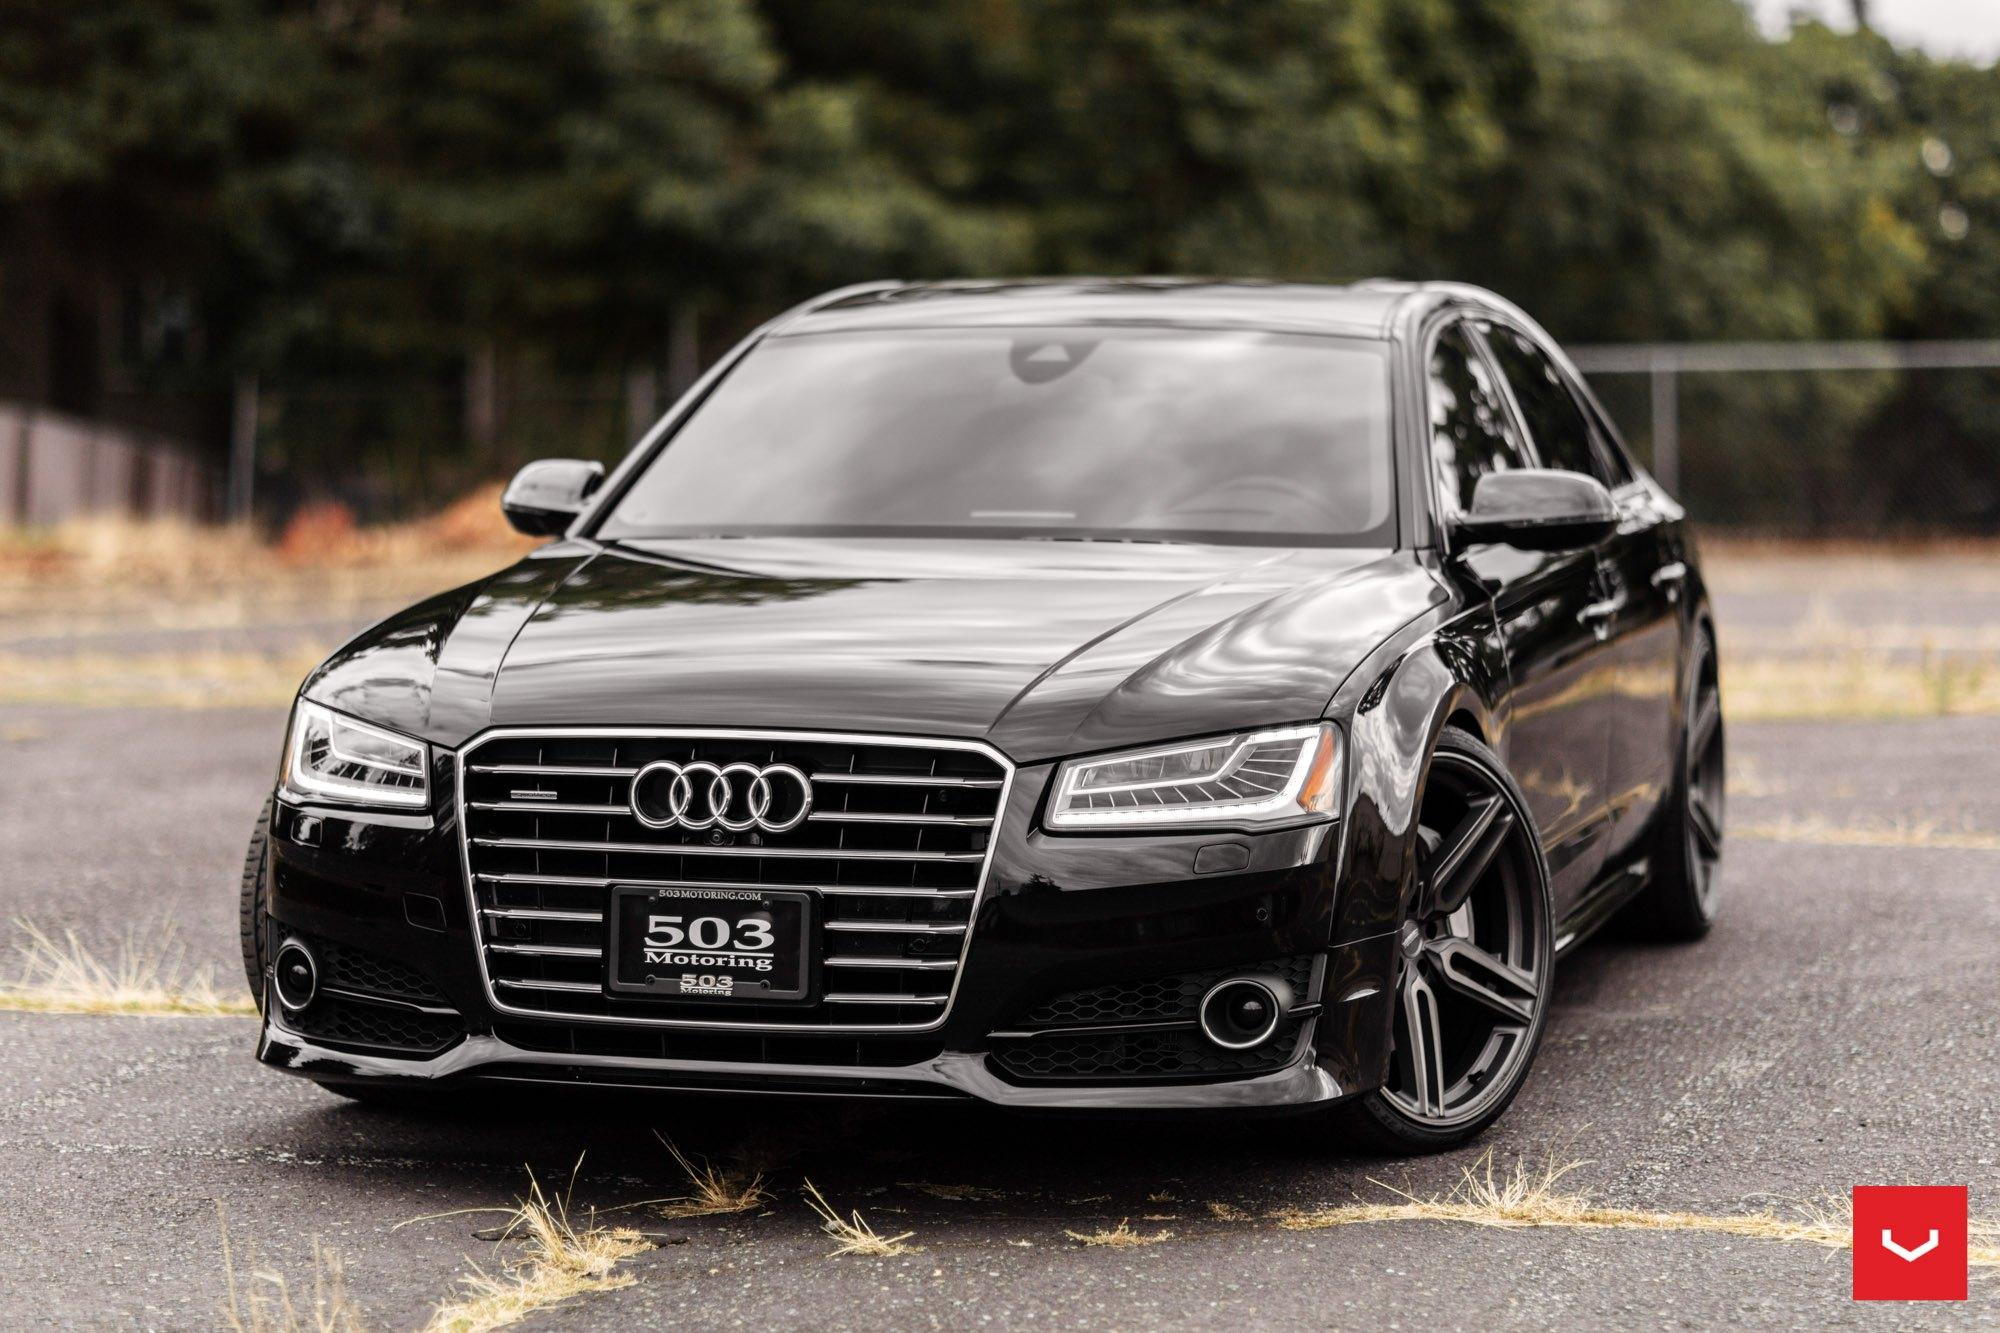 Black Audi A8 Gets More Luxurious Aftermarket Details Carid Com